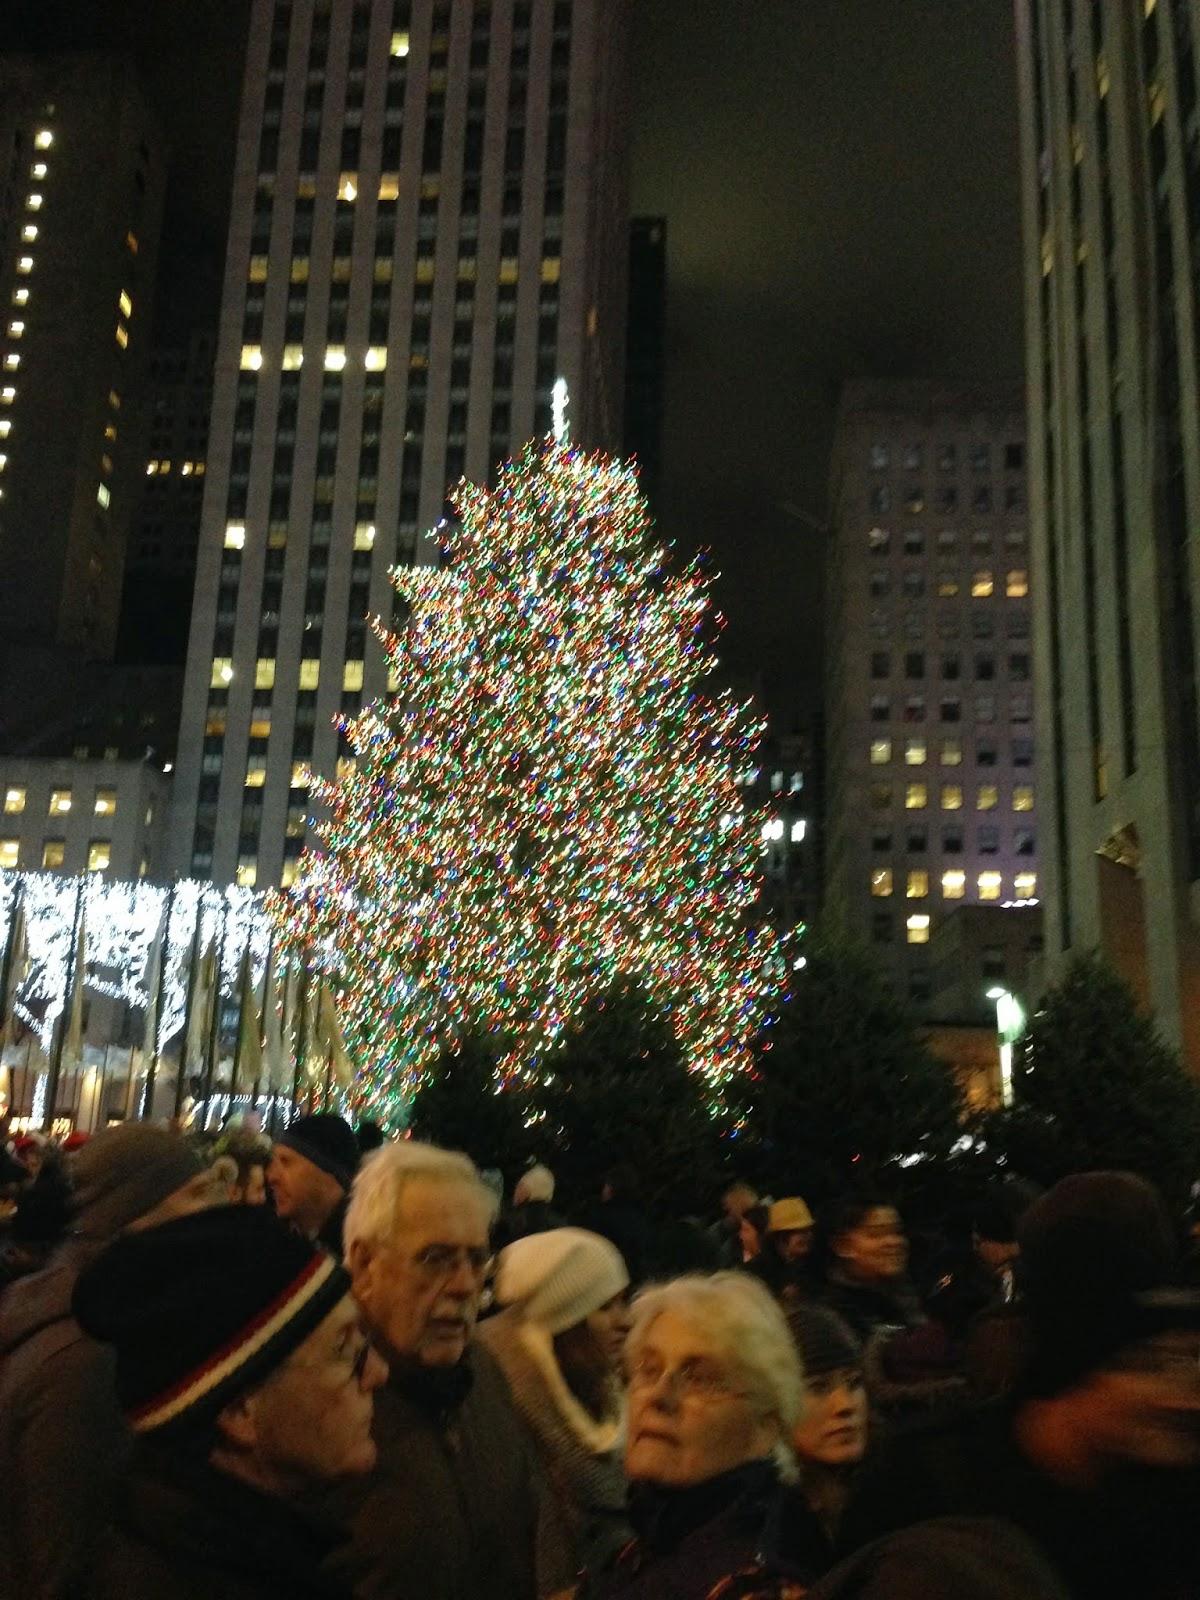 Fairly Merry: December 2014